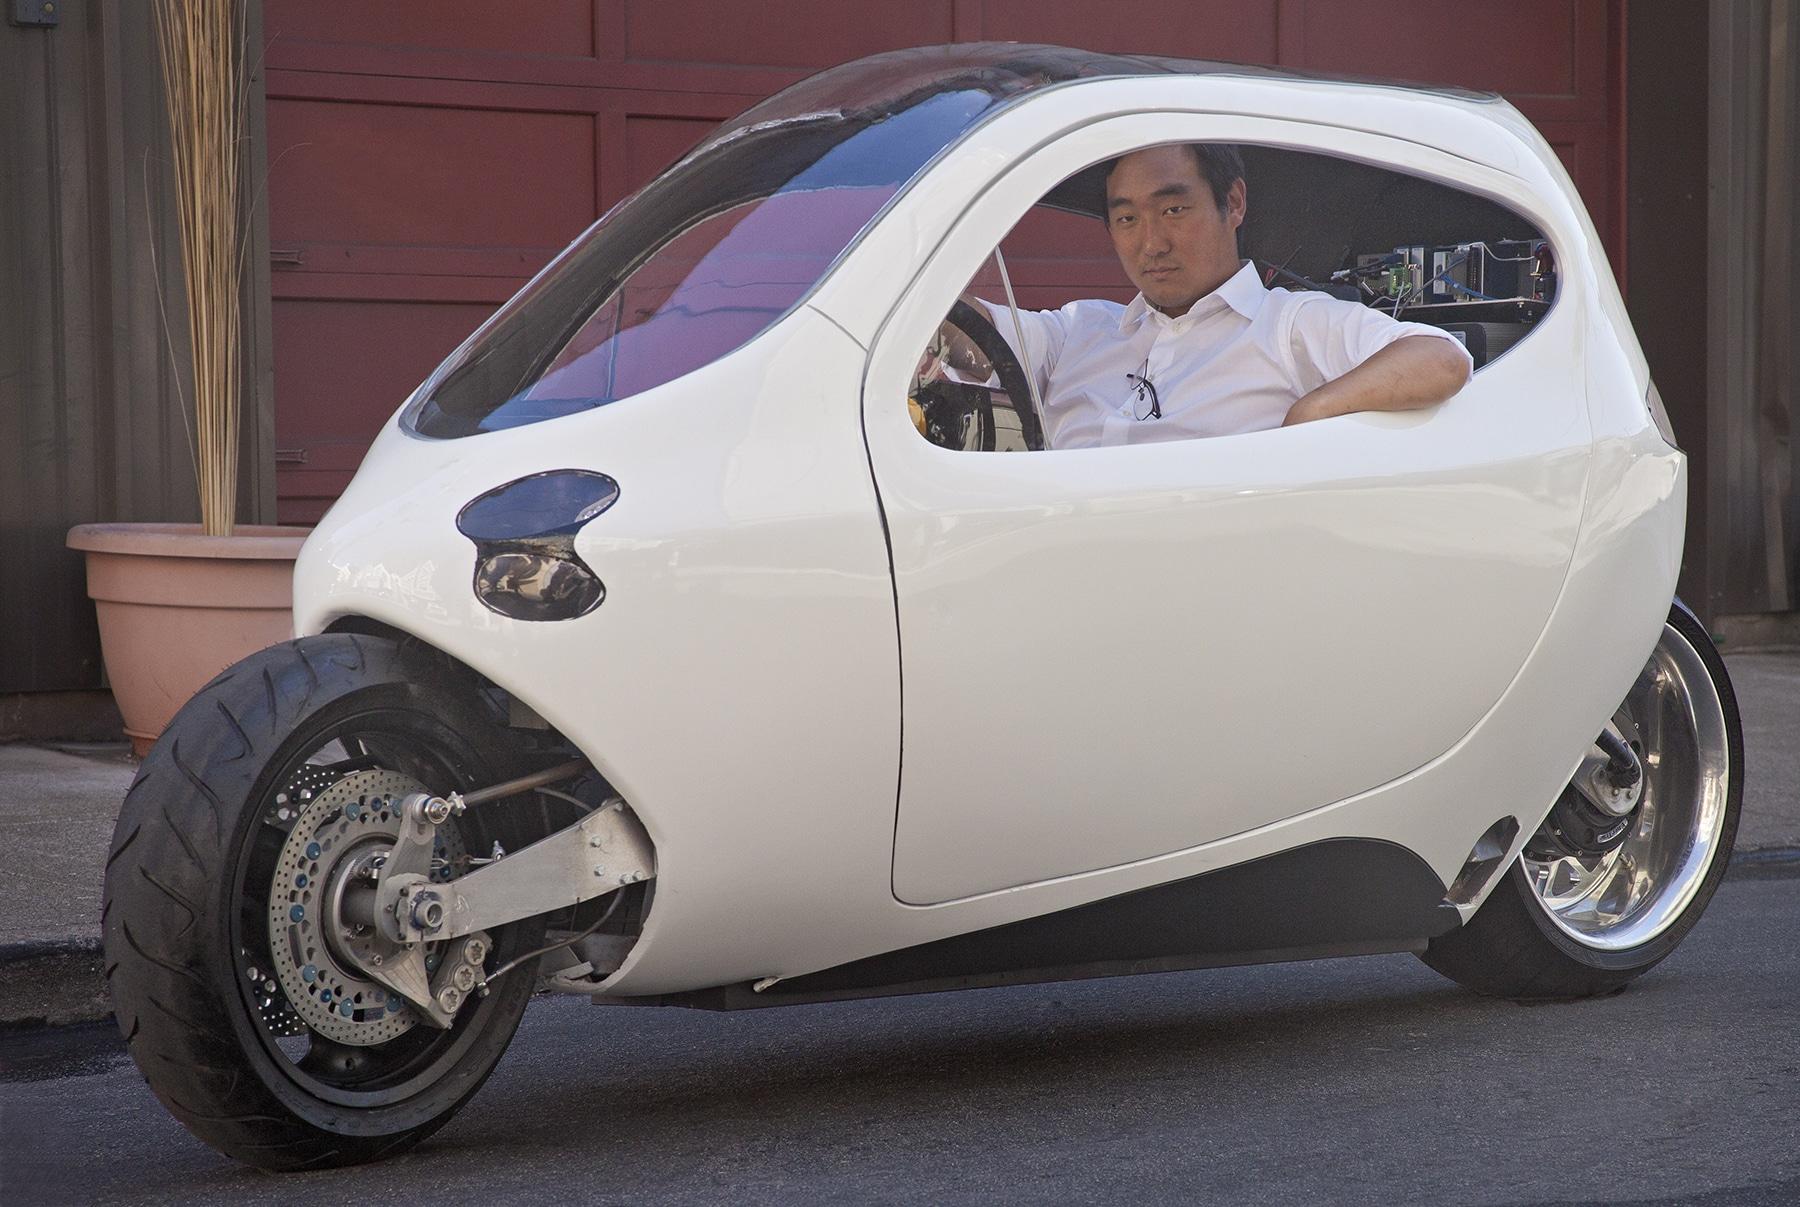 motorrad oder auto der lit motors c1 ist eine revolution scifi meets reality. Black Bedroom Furniture Sets. Home Design Ideas